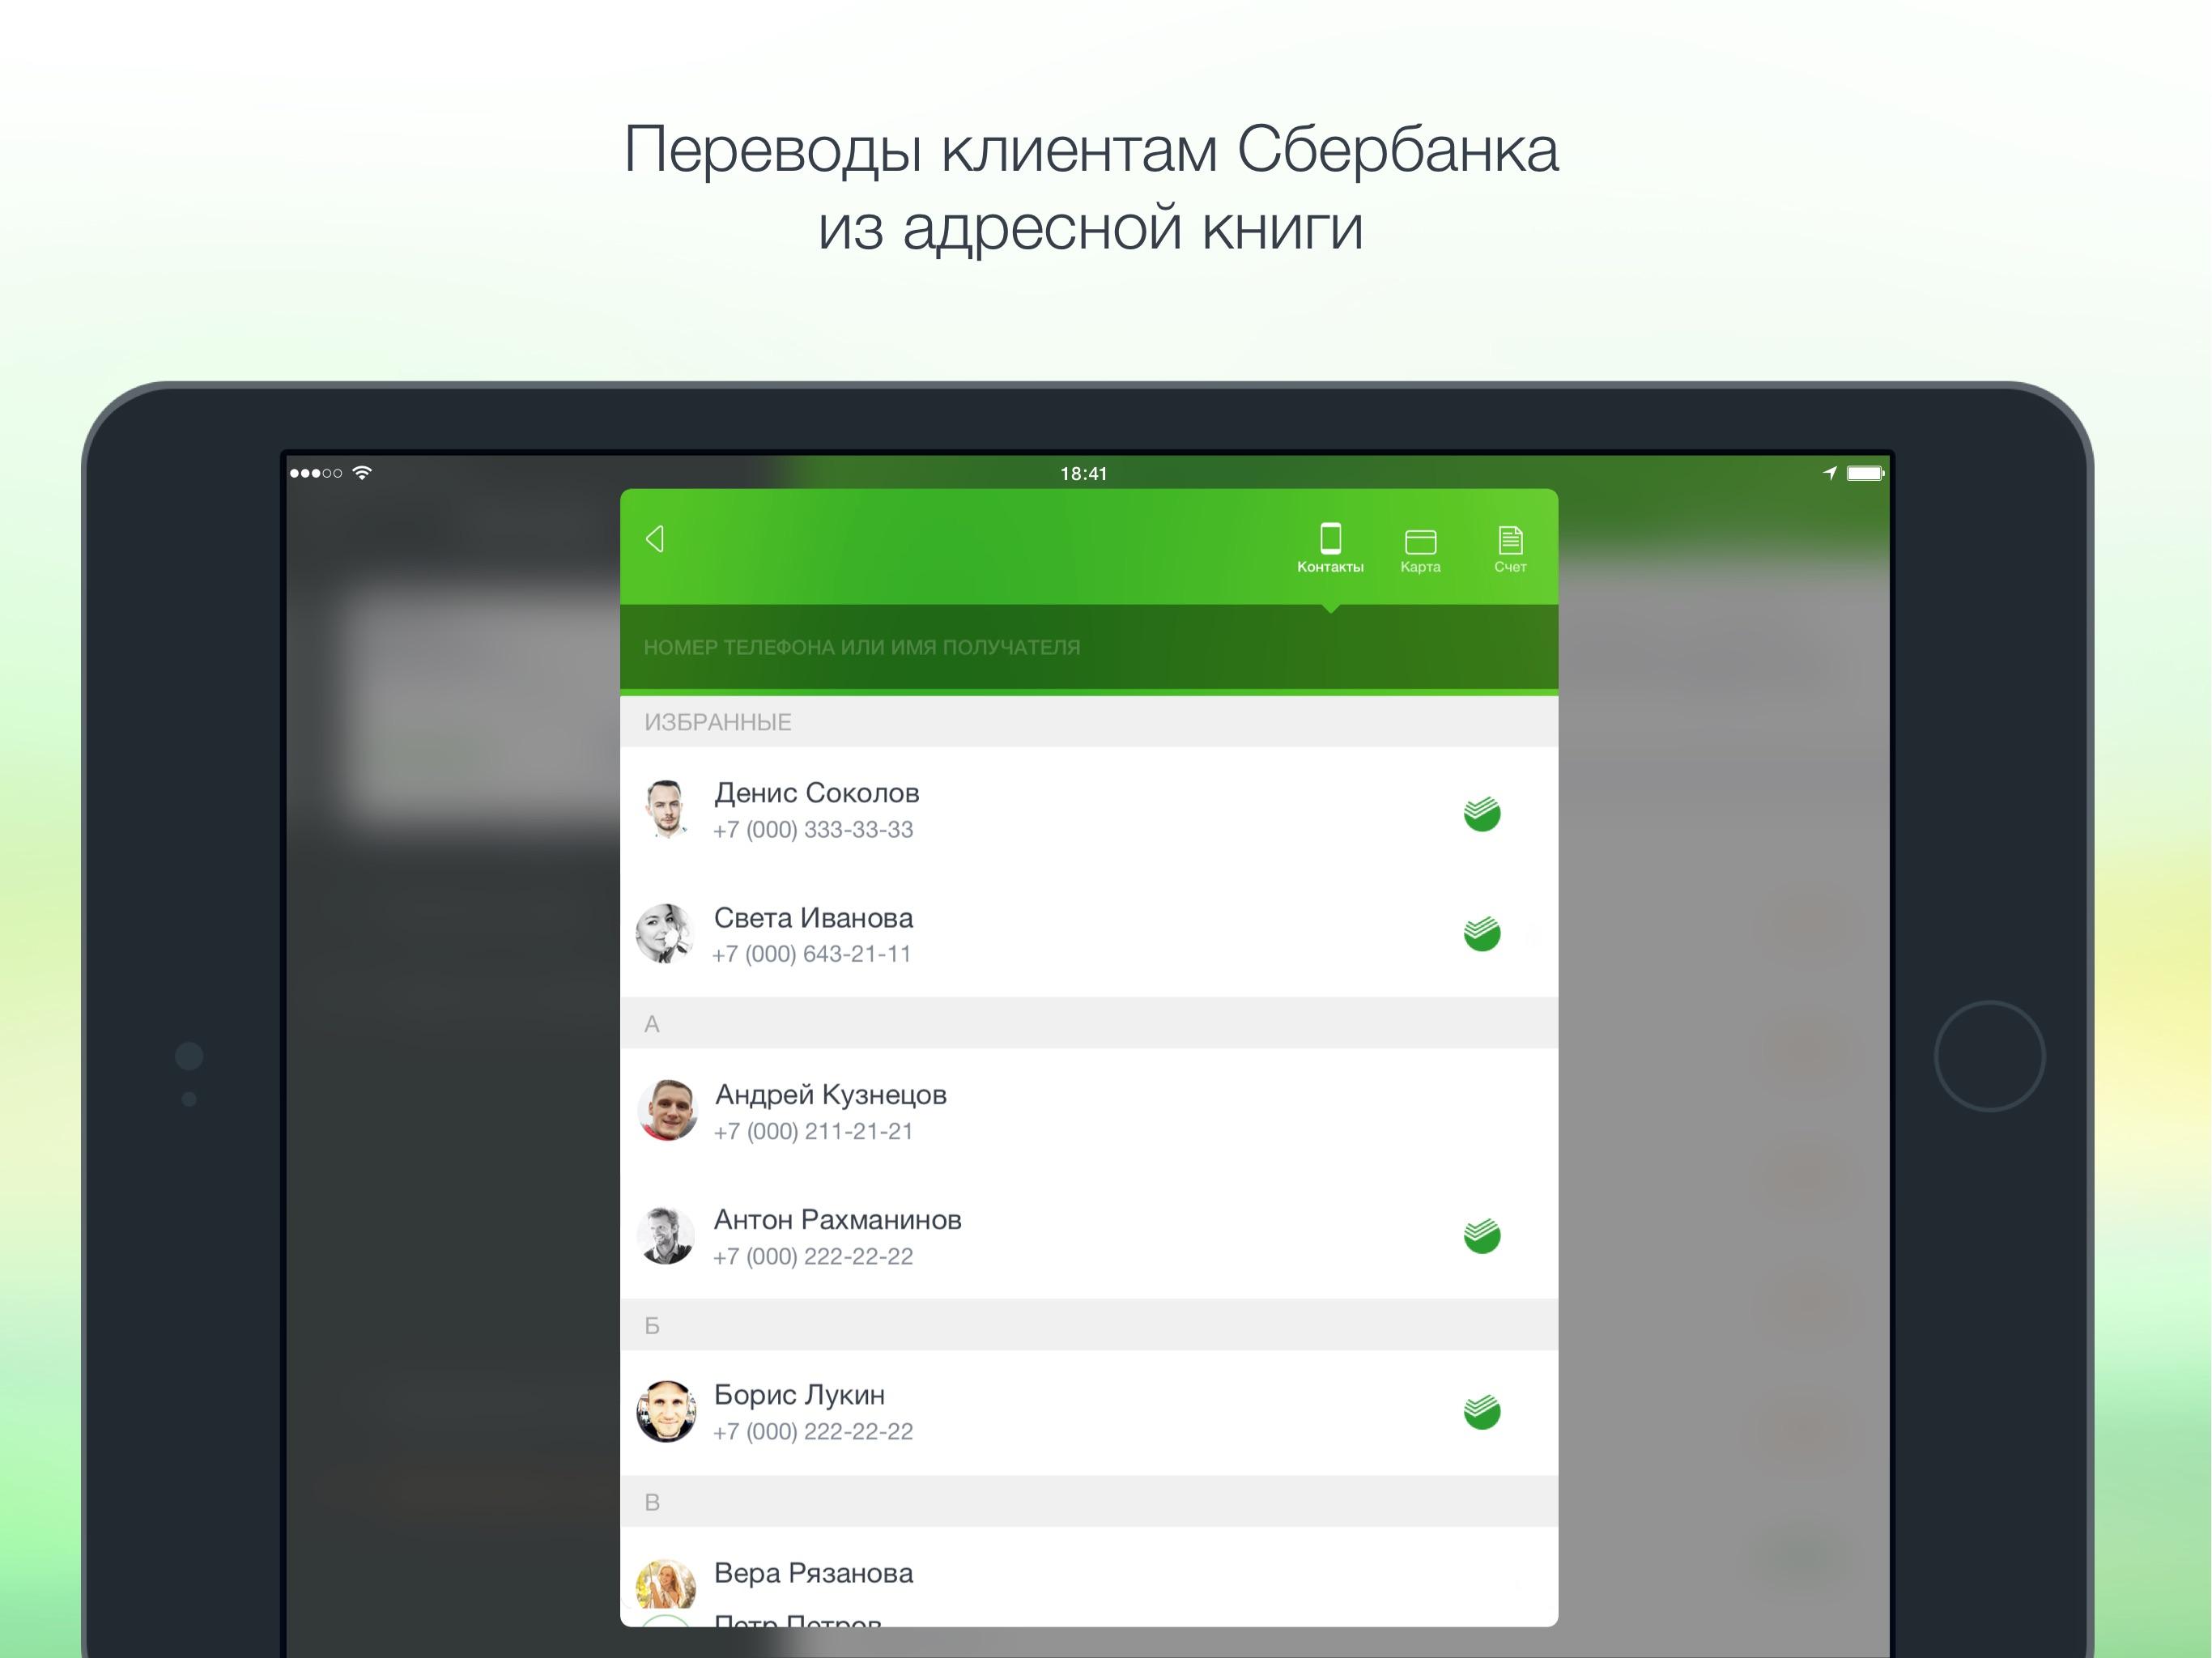 Сбербанк Онлайн для iPad Screenshot